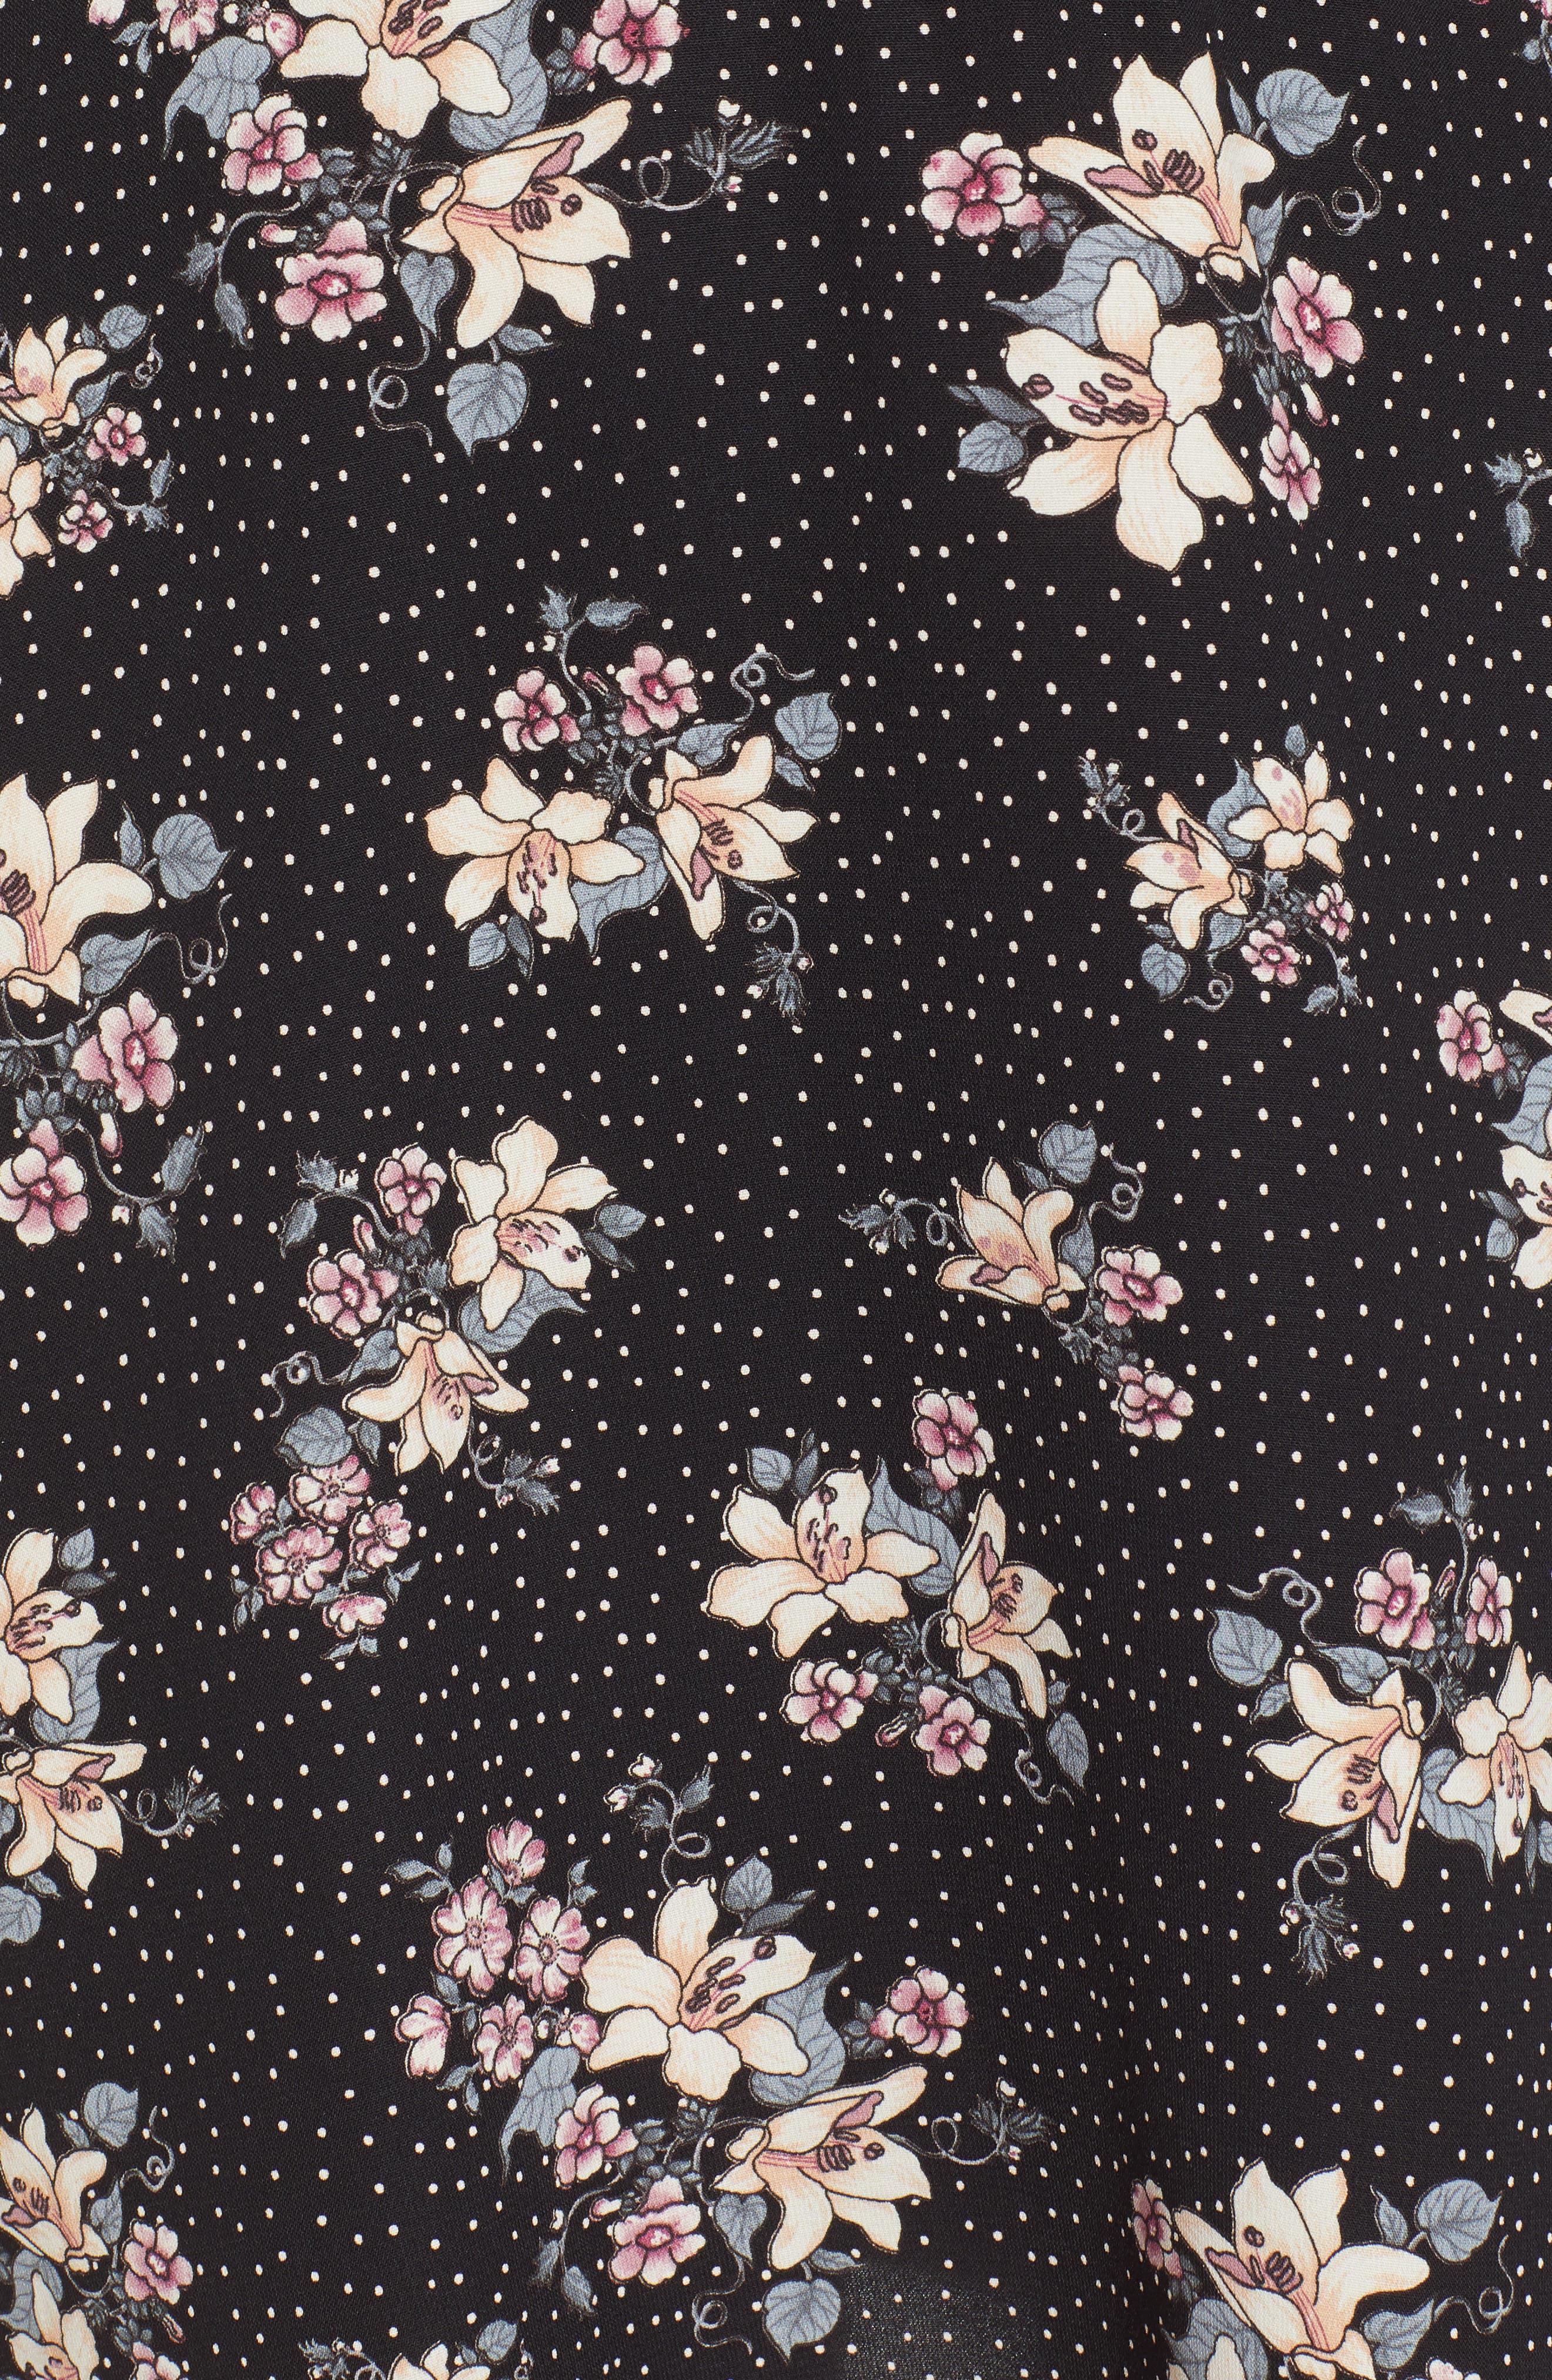 Printed Ruffle Sleeve Minidress,                             Alternate thumbnail 6, color,                             001